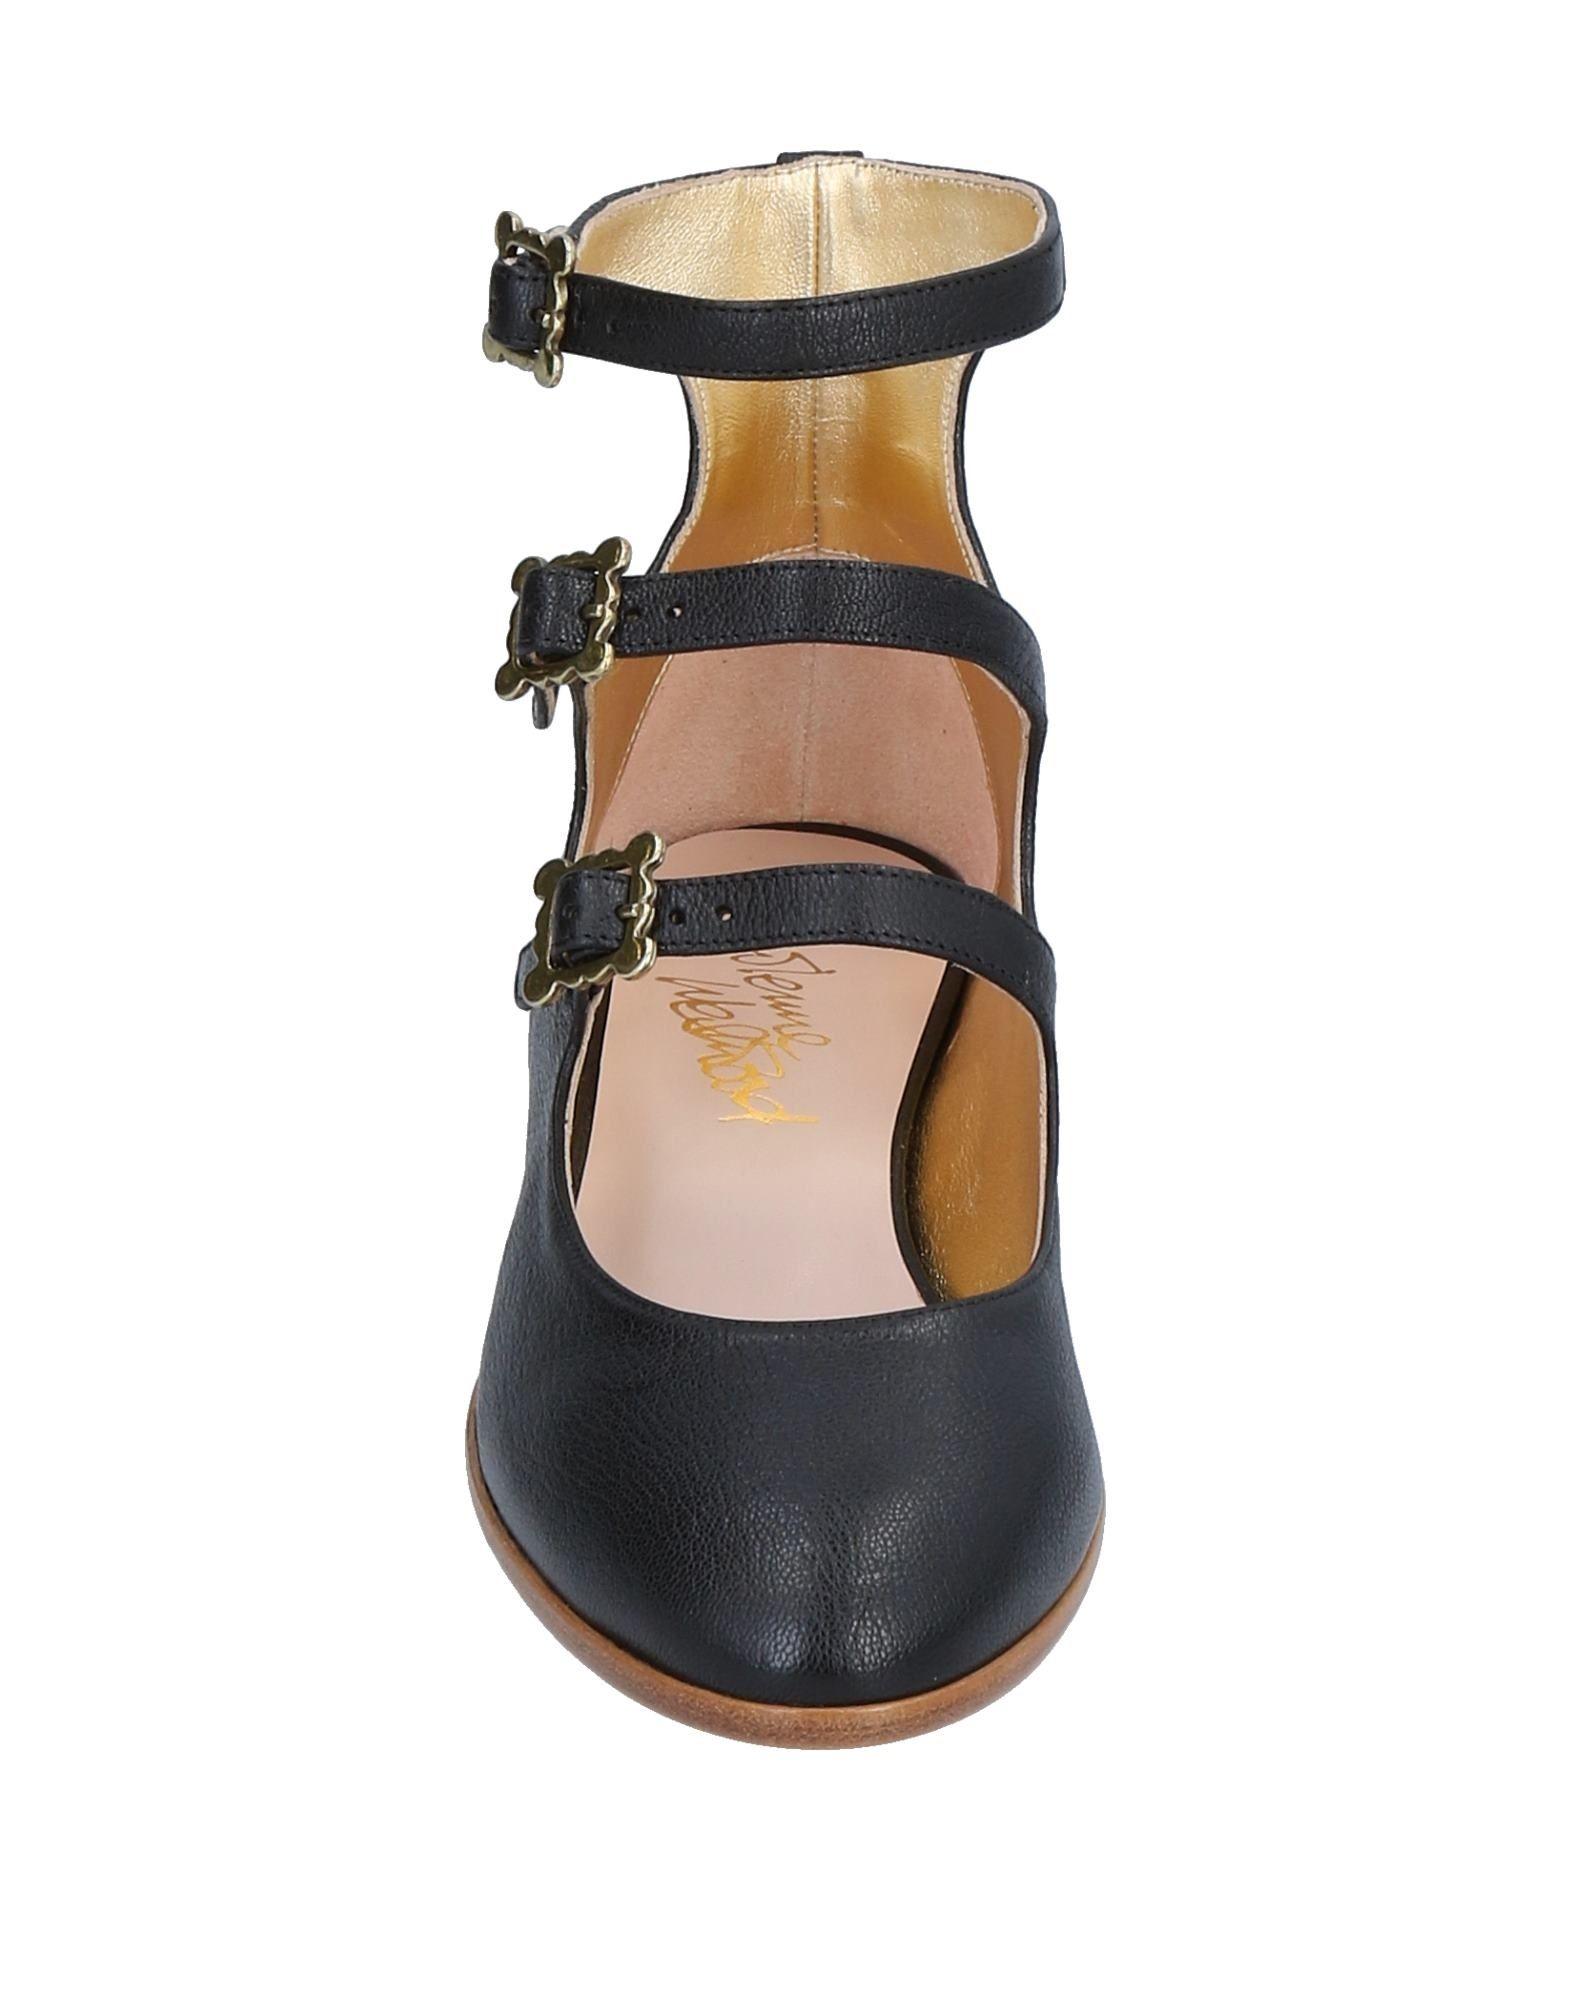 Rabatt Westwood Schuhe Vivienne Westwood Rabatt Stiefelette Damen  11520986WL d64242